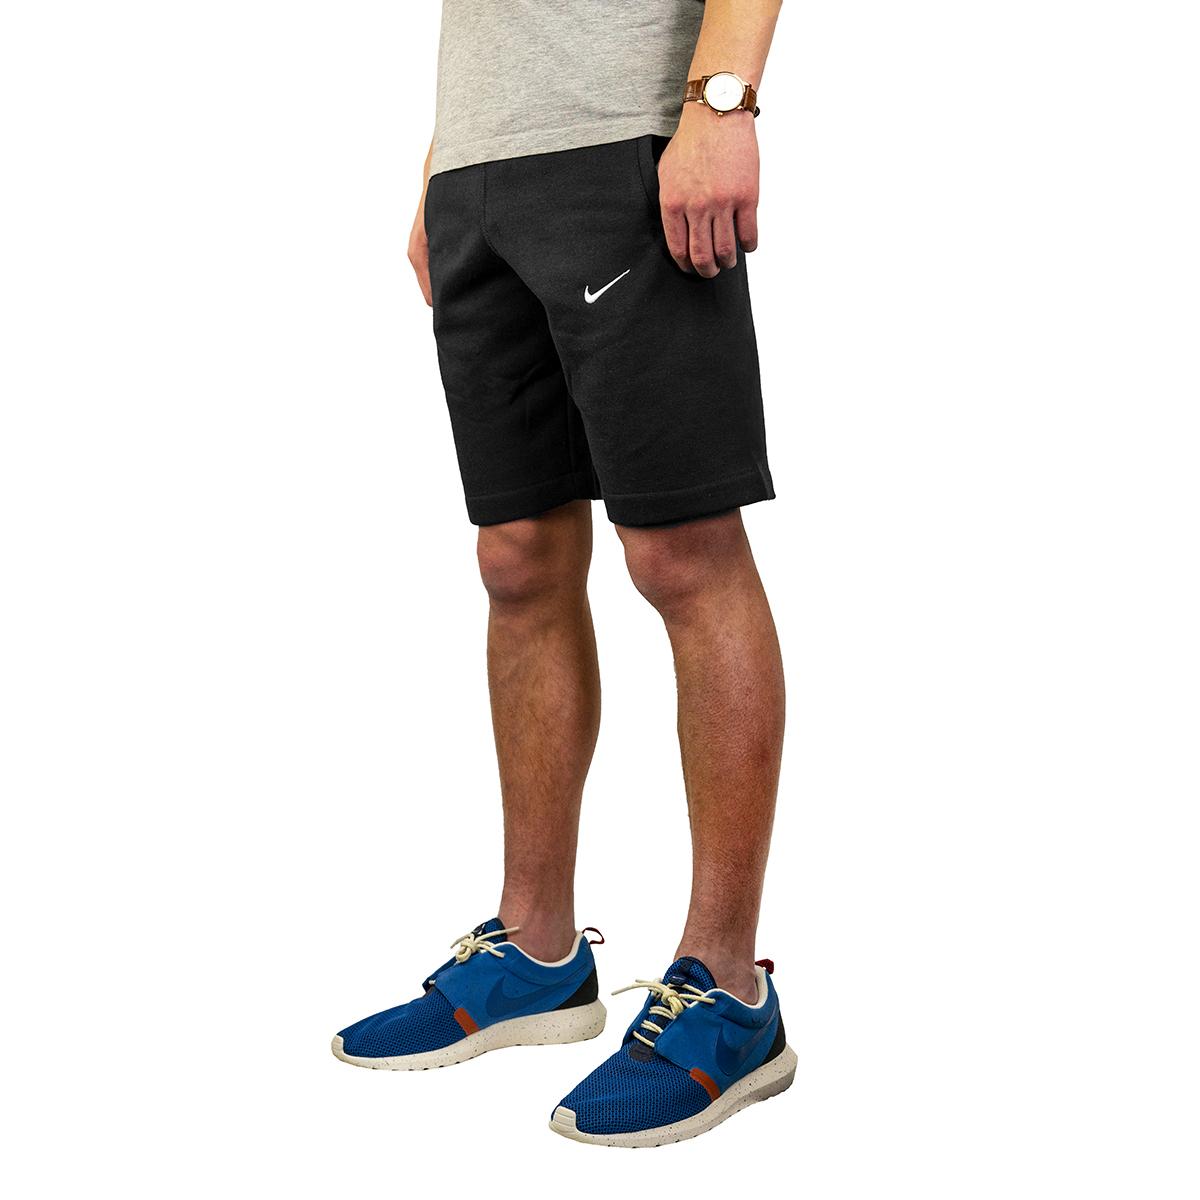 Nike Men's Crusader Shorts